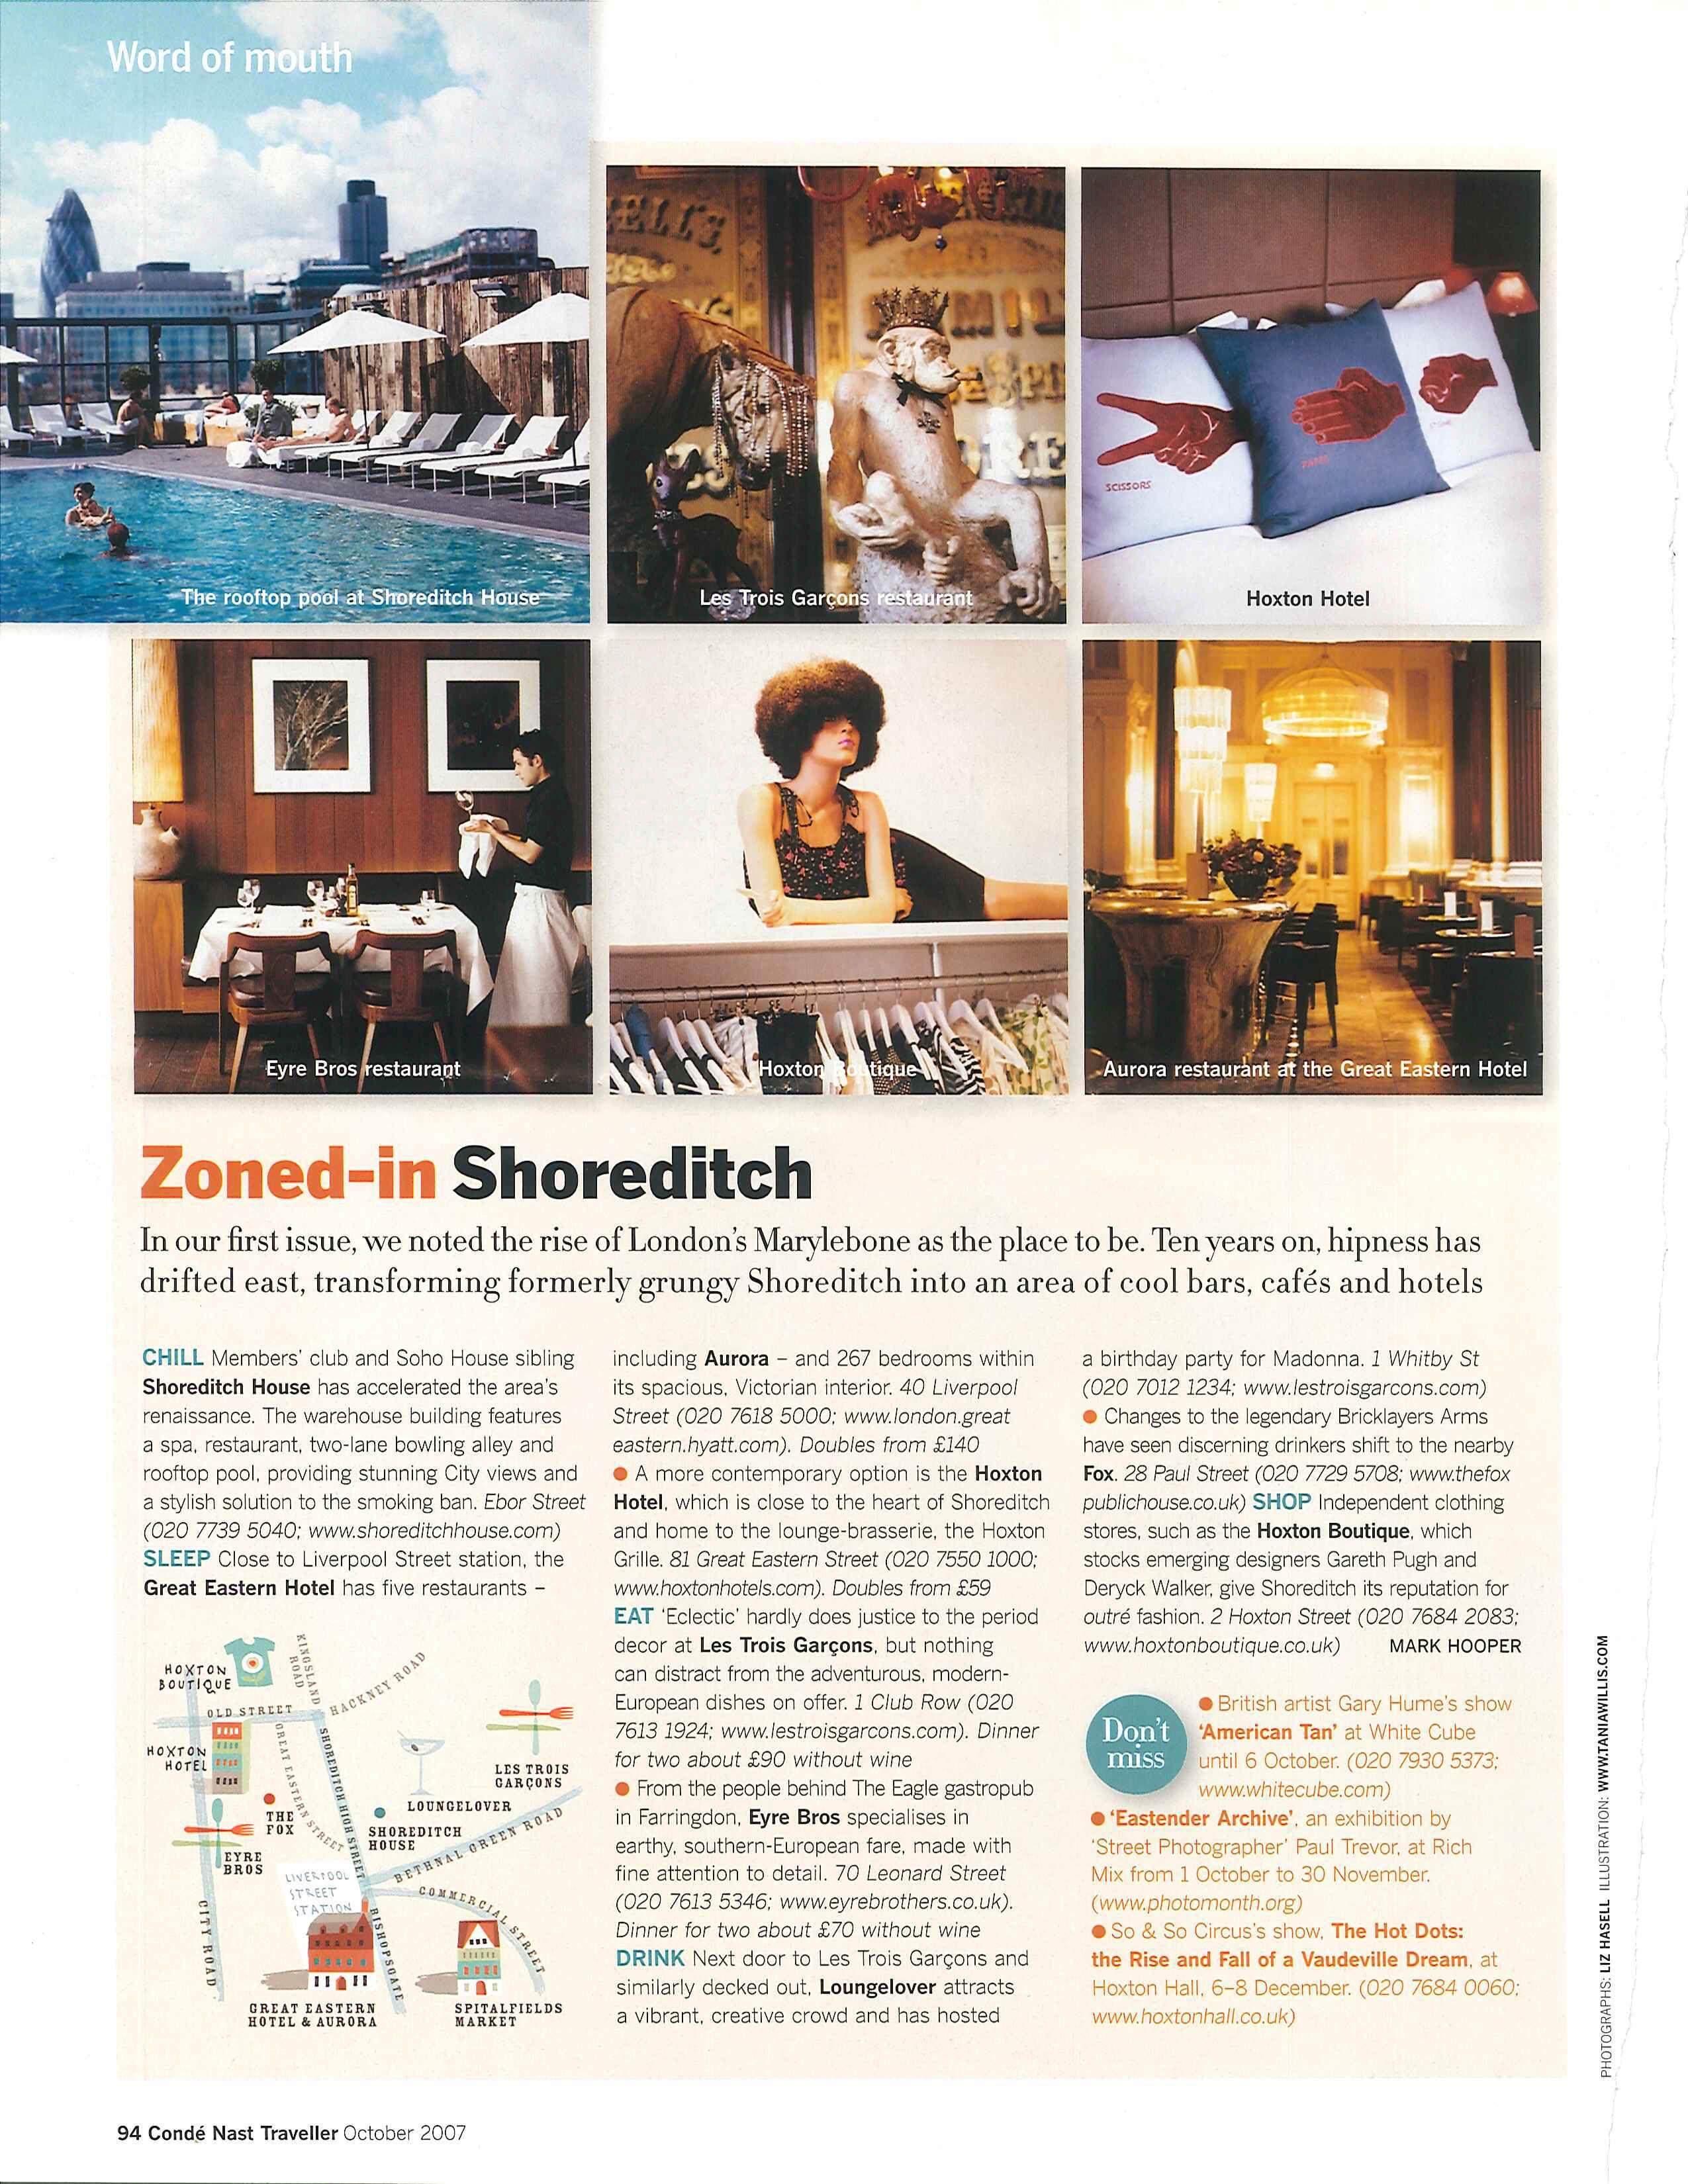 Soho House Shoreditch: Guide To Shoreditch, UK: Hoxton Hotel, Shoreditch House, Etc